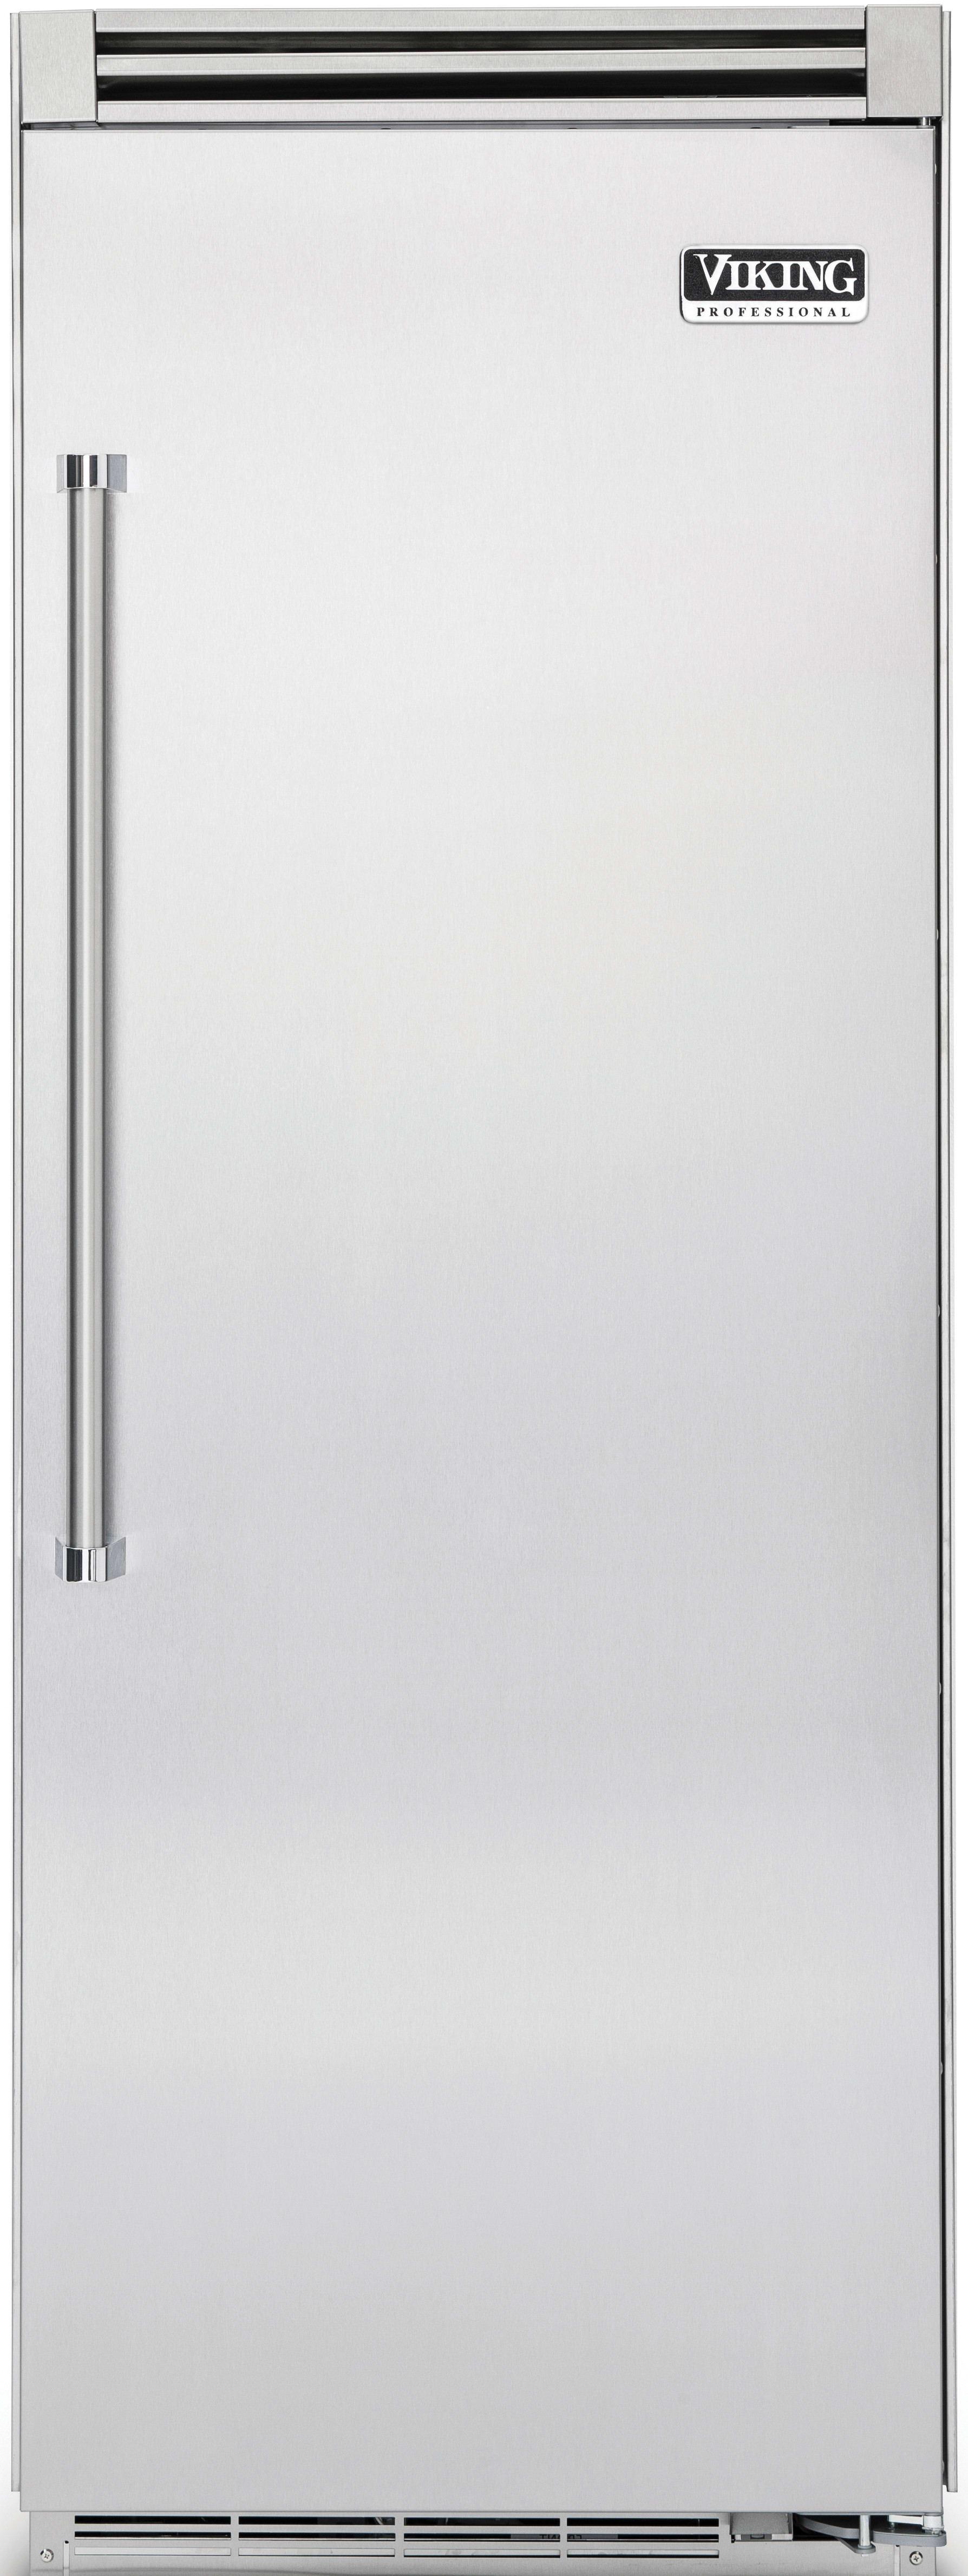 Viking Vcfb5363rwh 36 Inch Built In Full Freezer Column